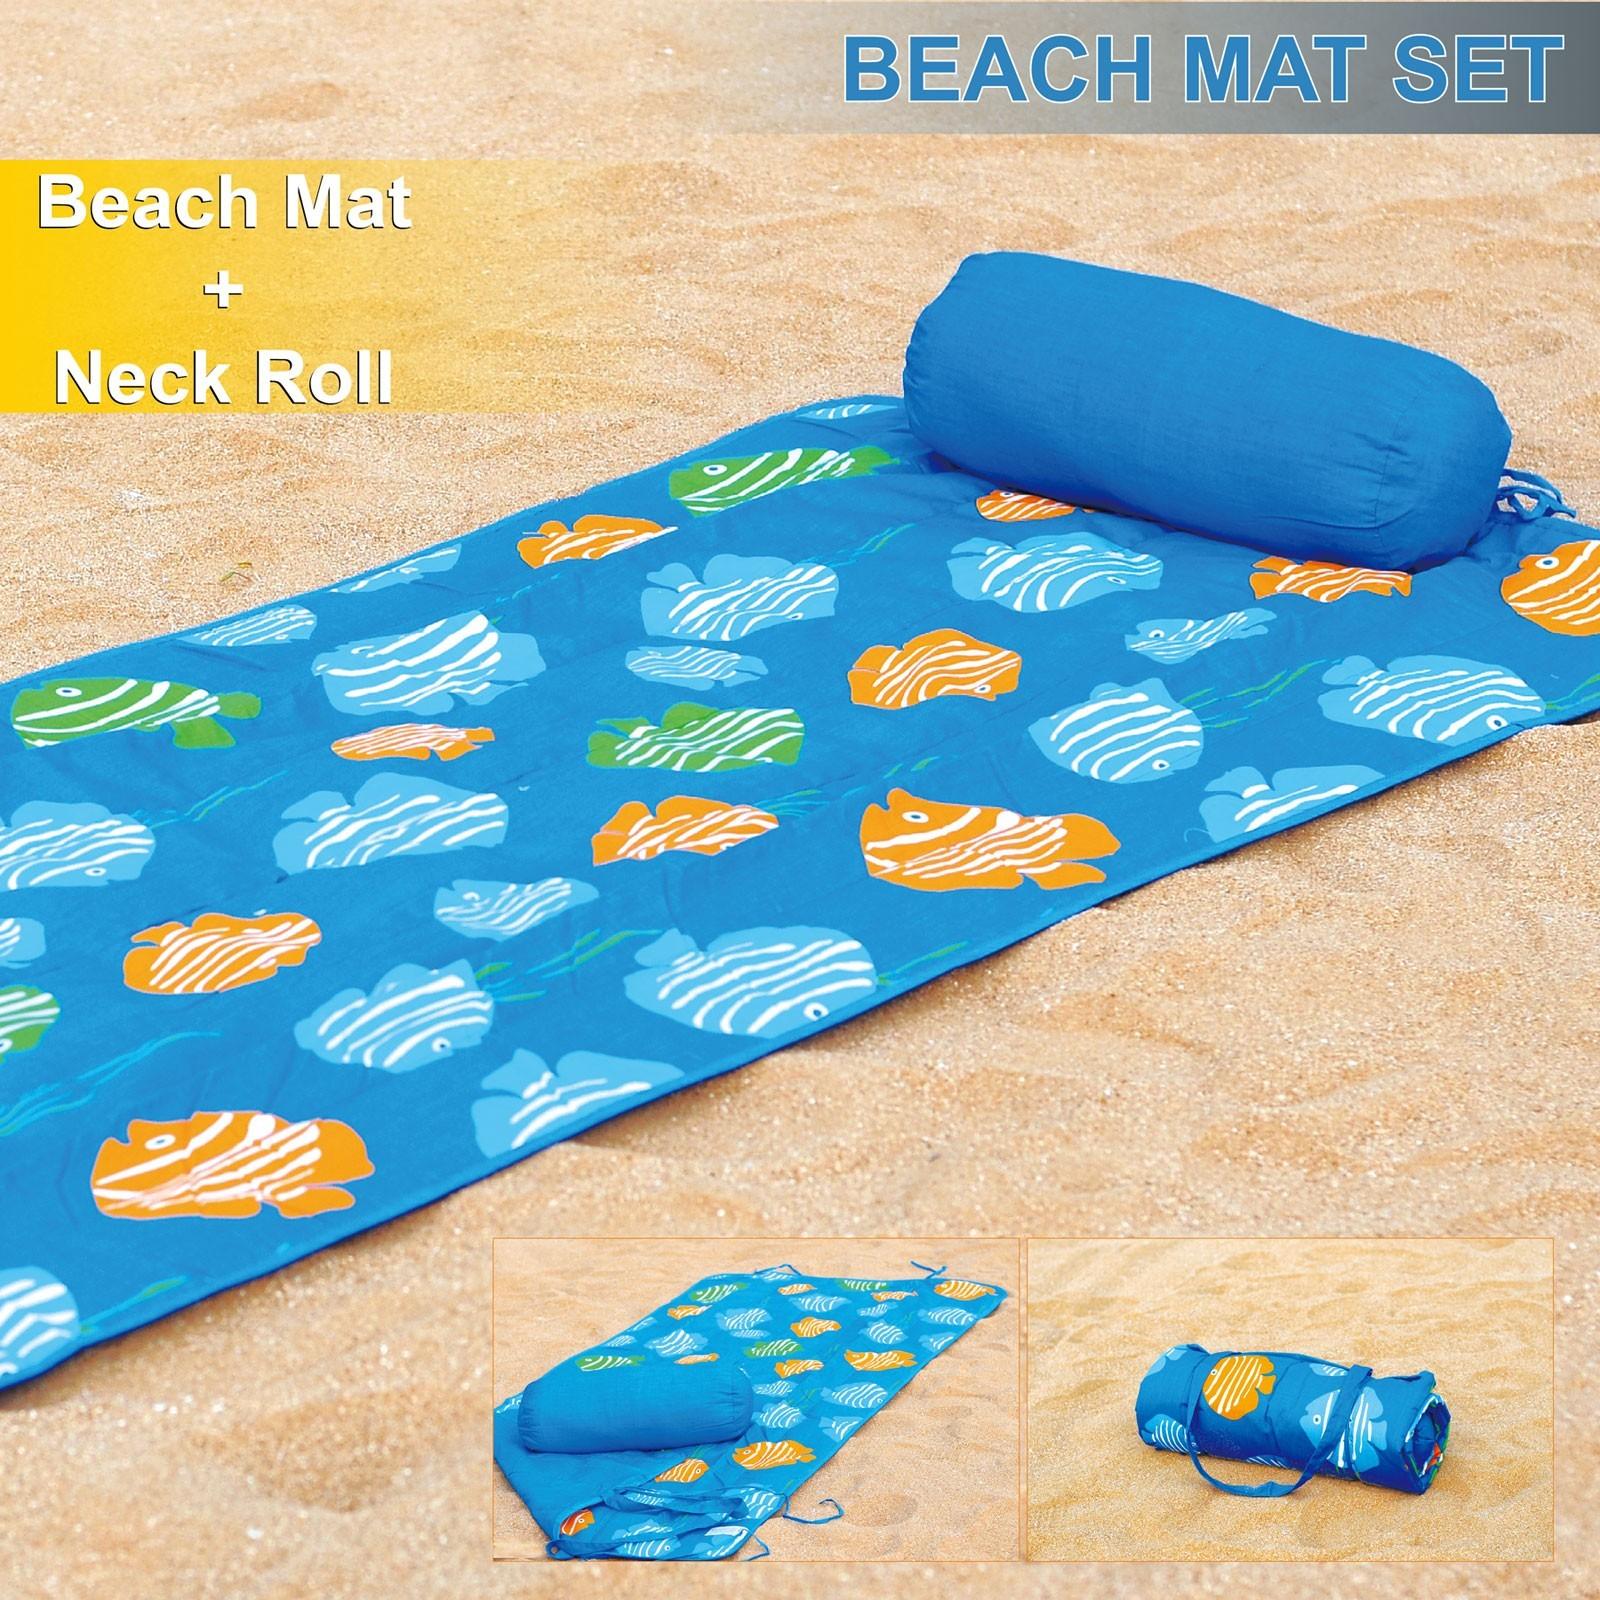 Roll-Up Reversible Beach Mat with Neck PillowTropical Fish